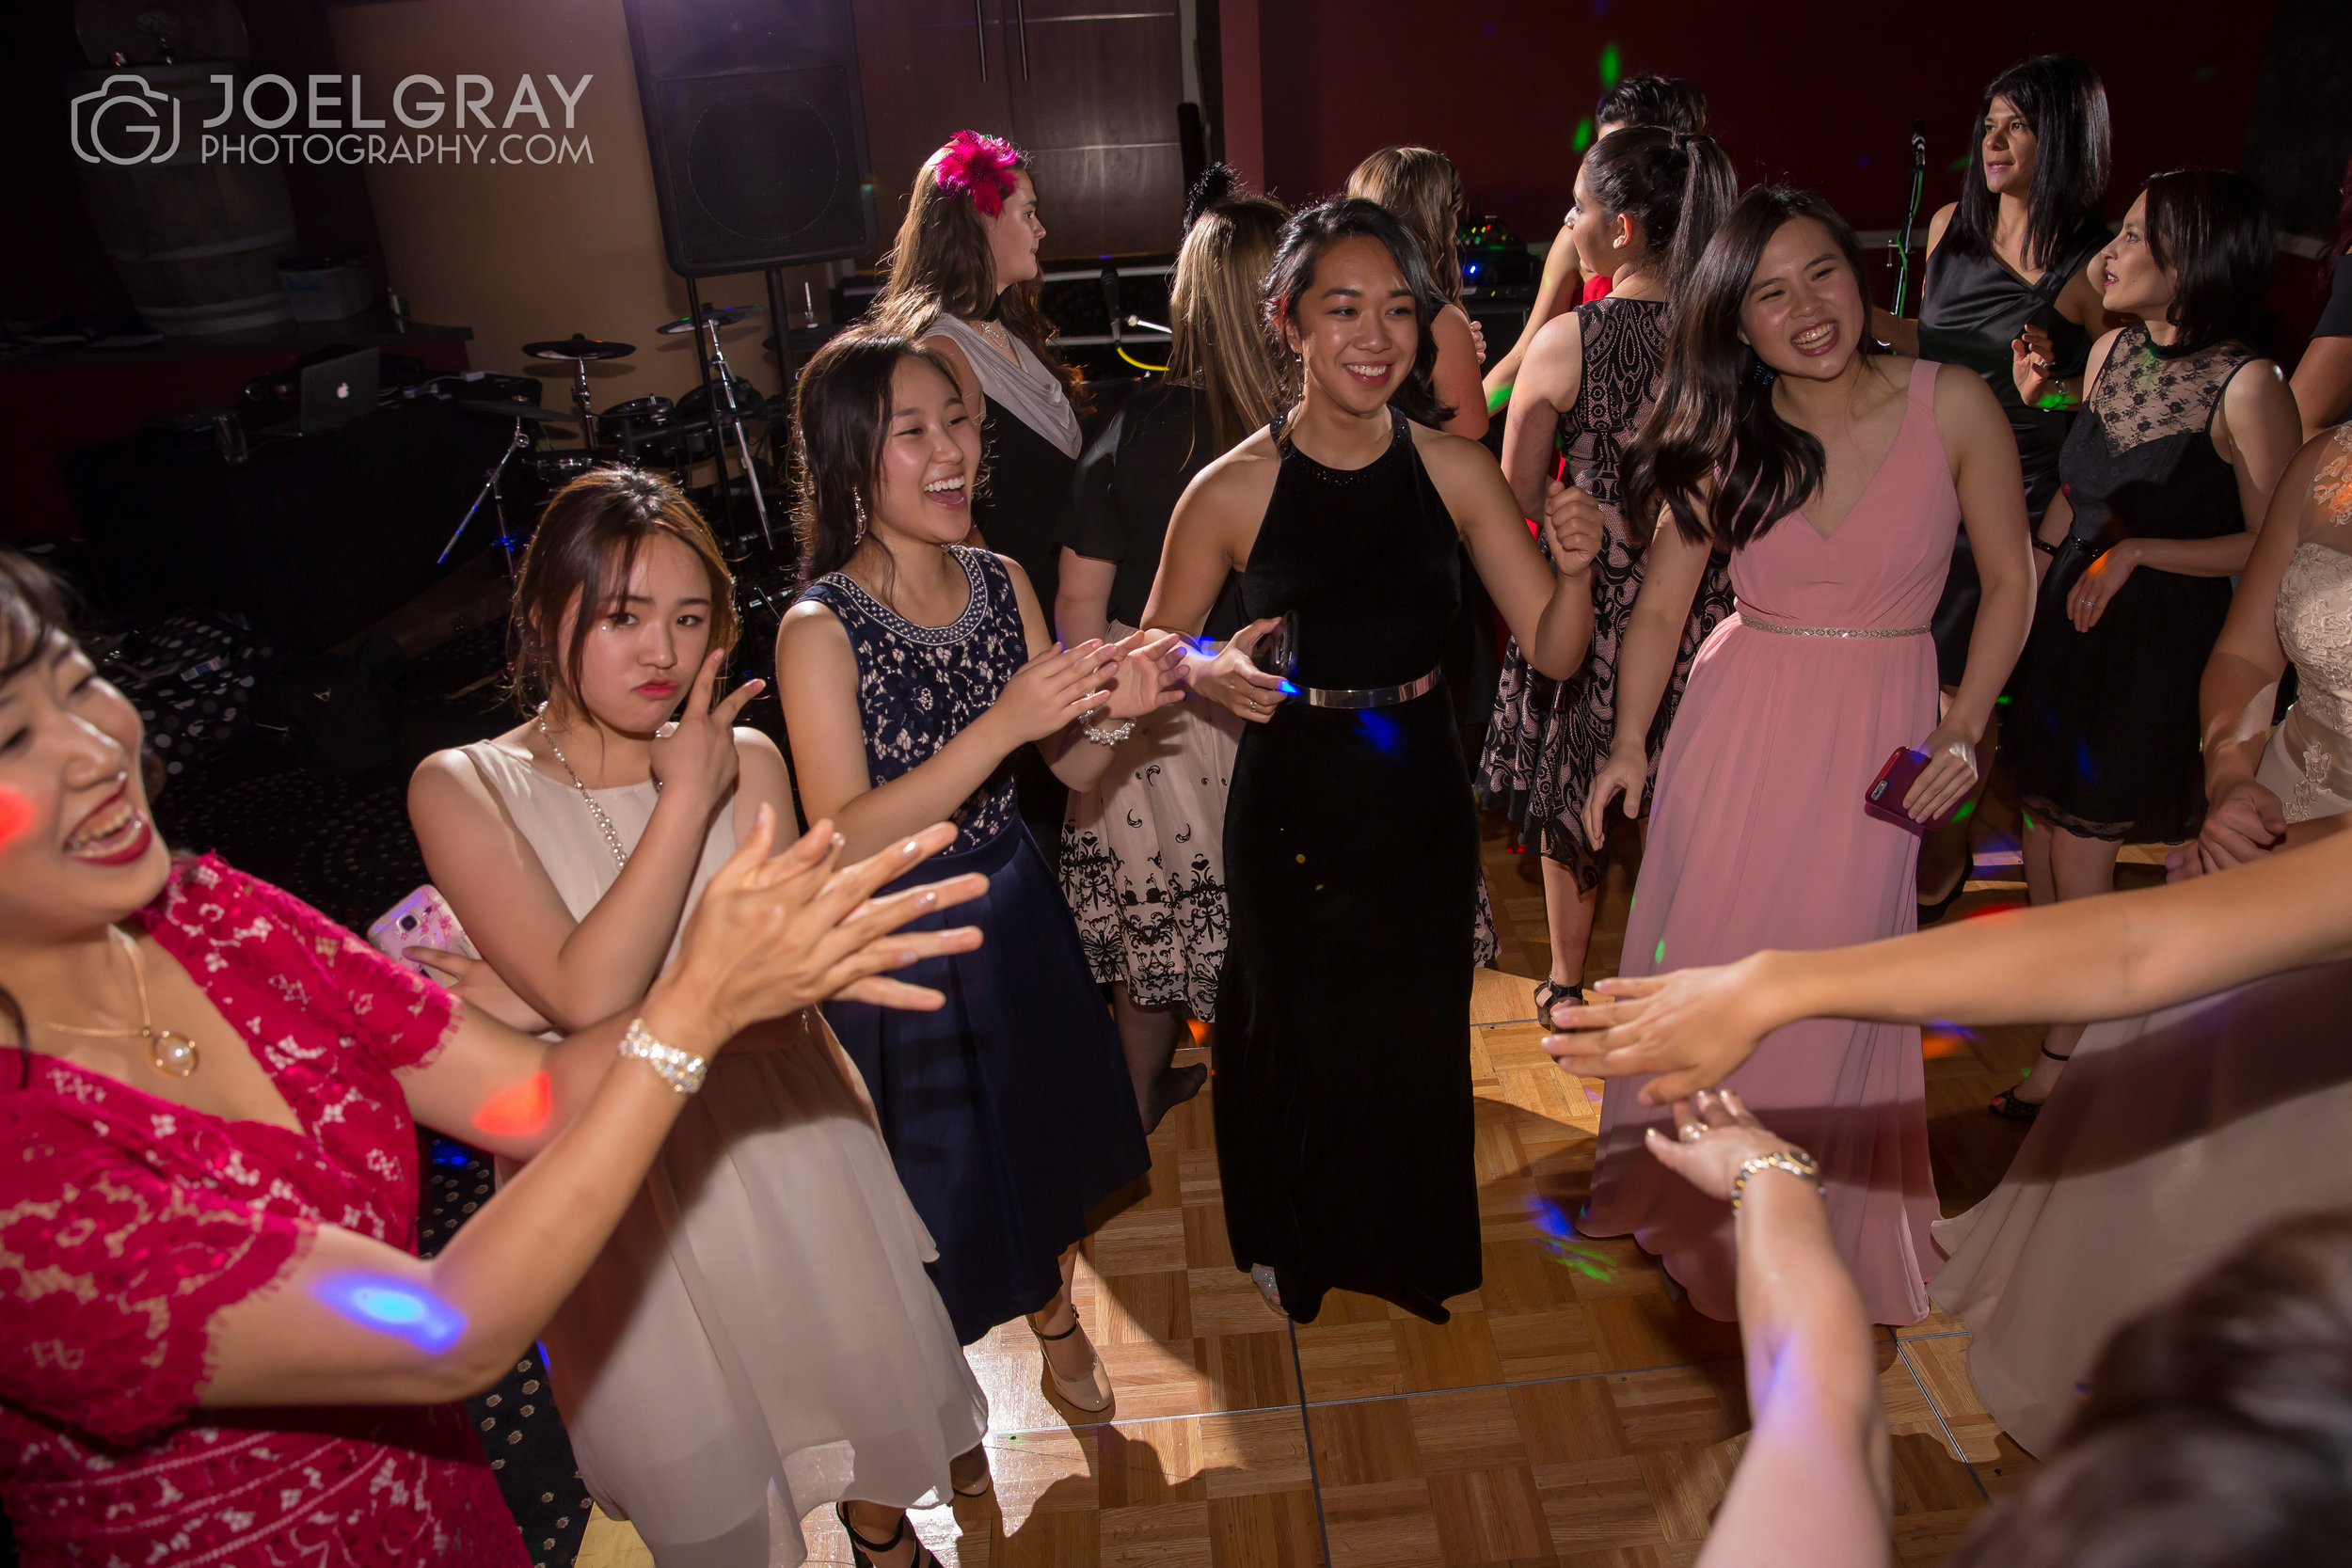 dance-floor-events-photographer-sydney-1800829994